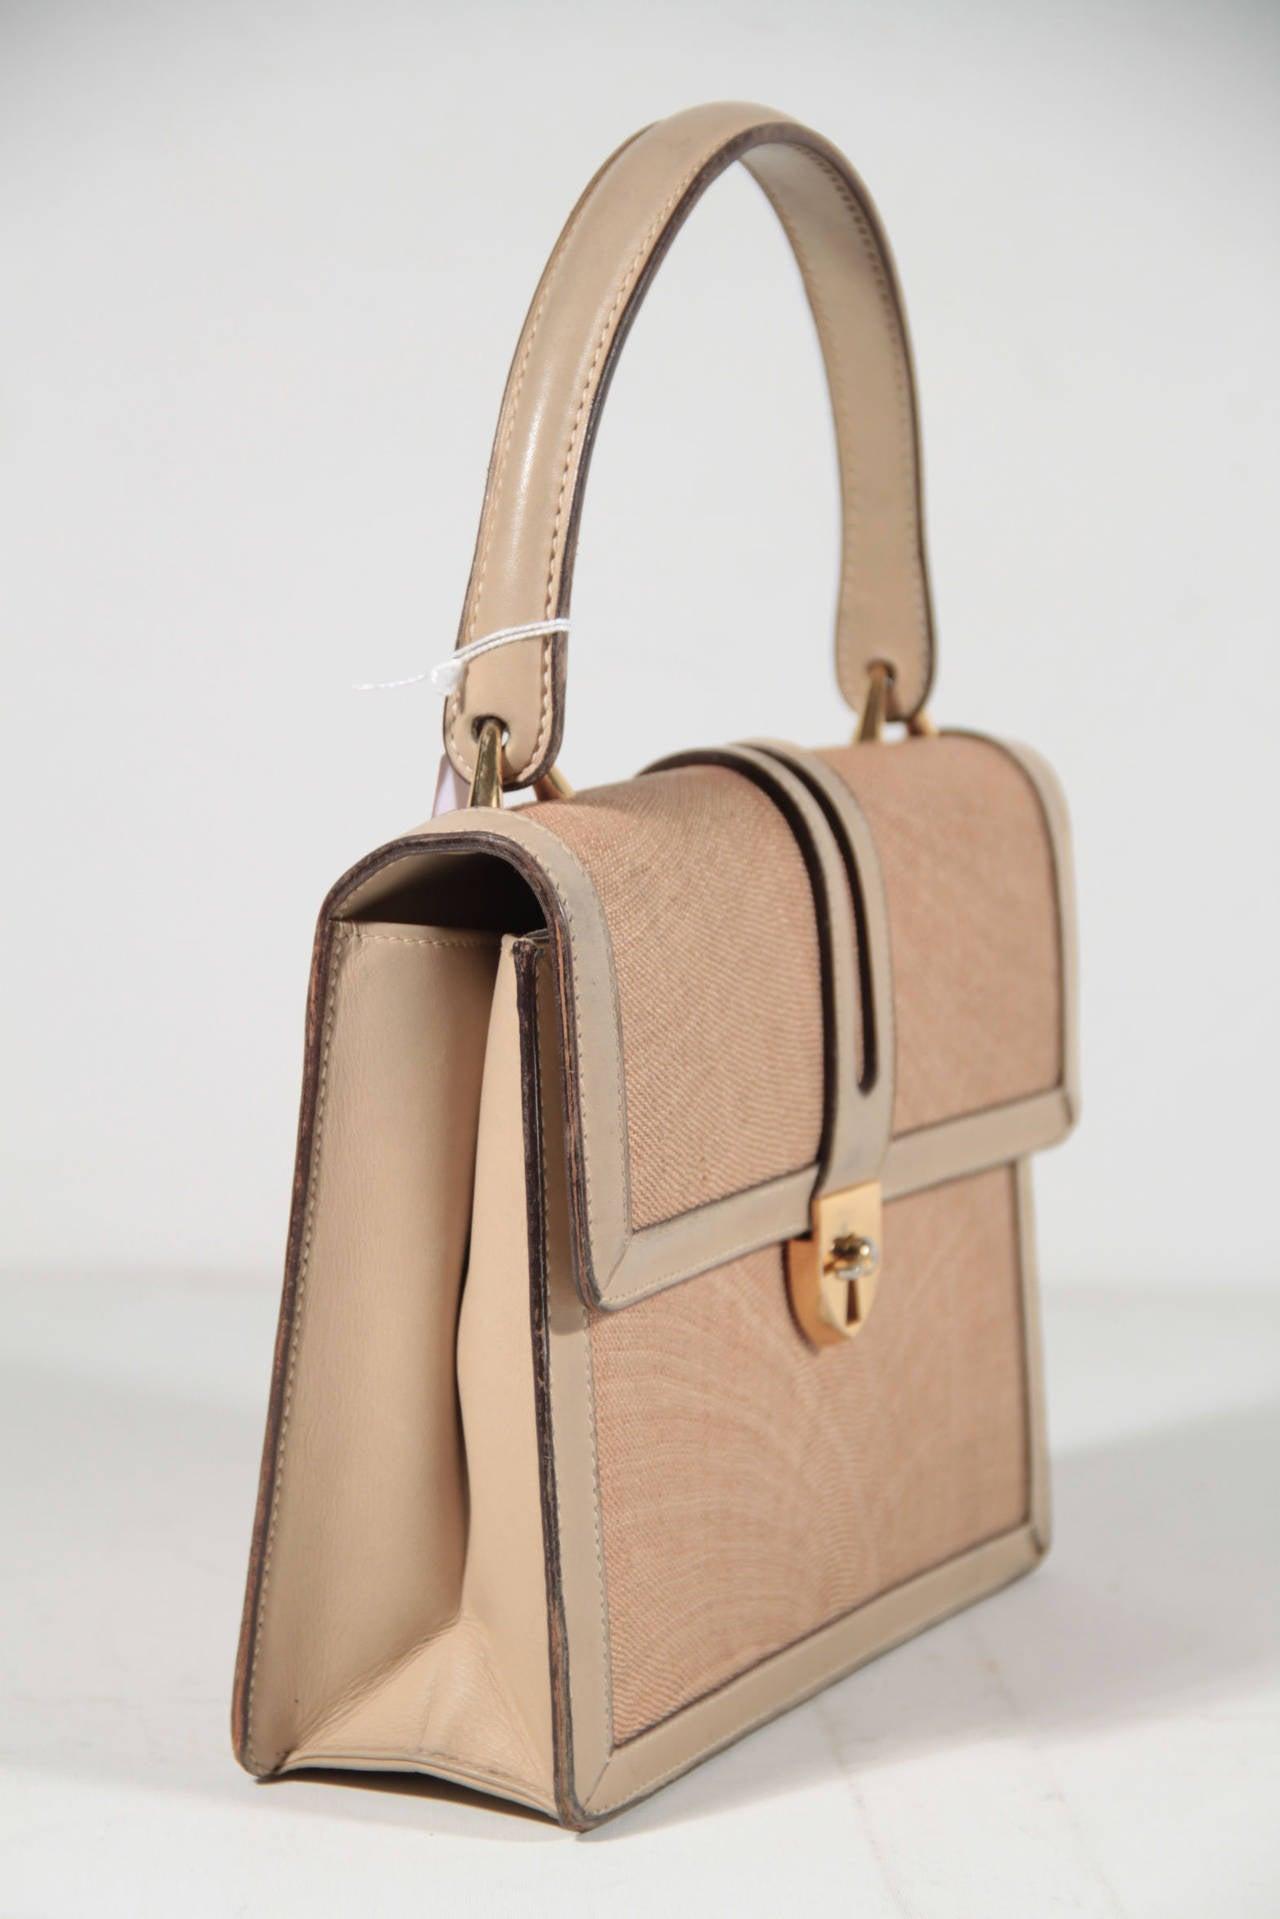 Gucci Italian Vintage Beige Tan Raffia And Leather Handbag